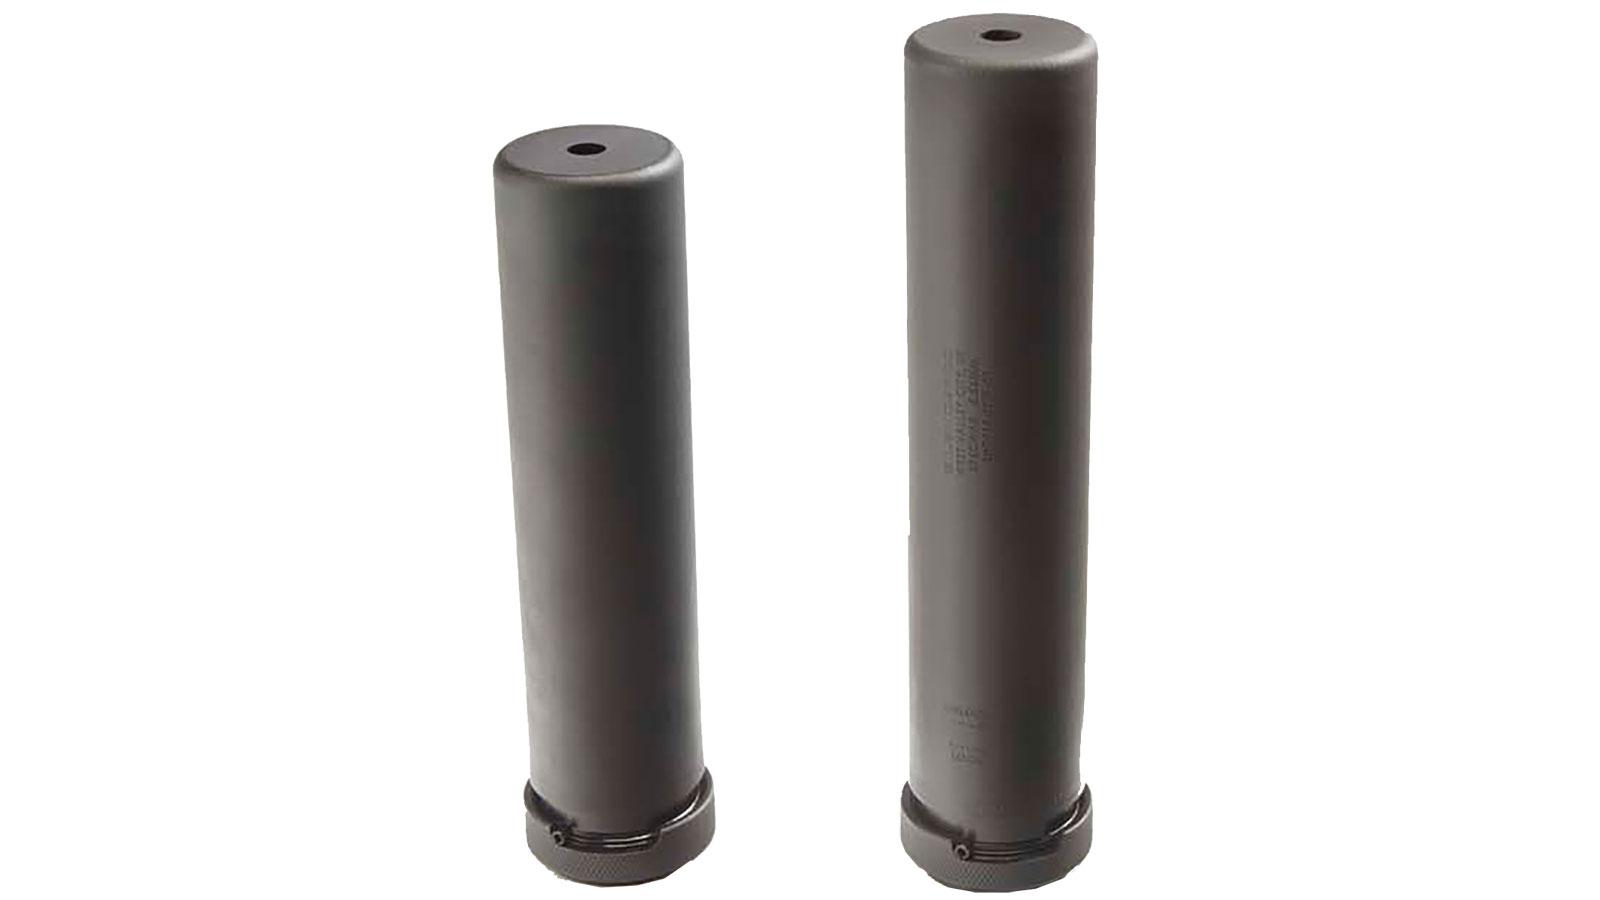 SilencerCo SpecWar K Suppressor 5.56mm Black With Flash Hider SU850